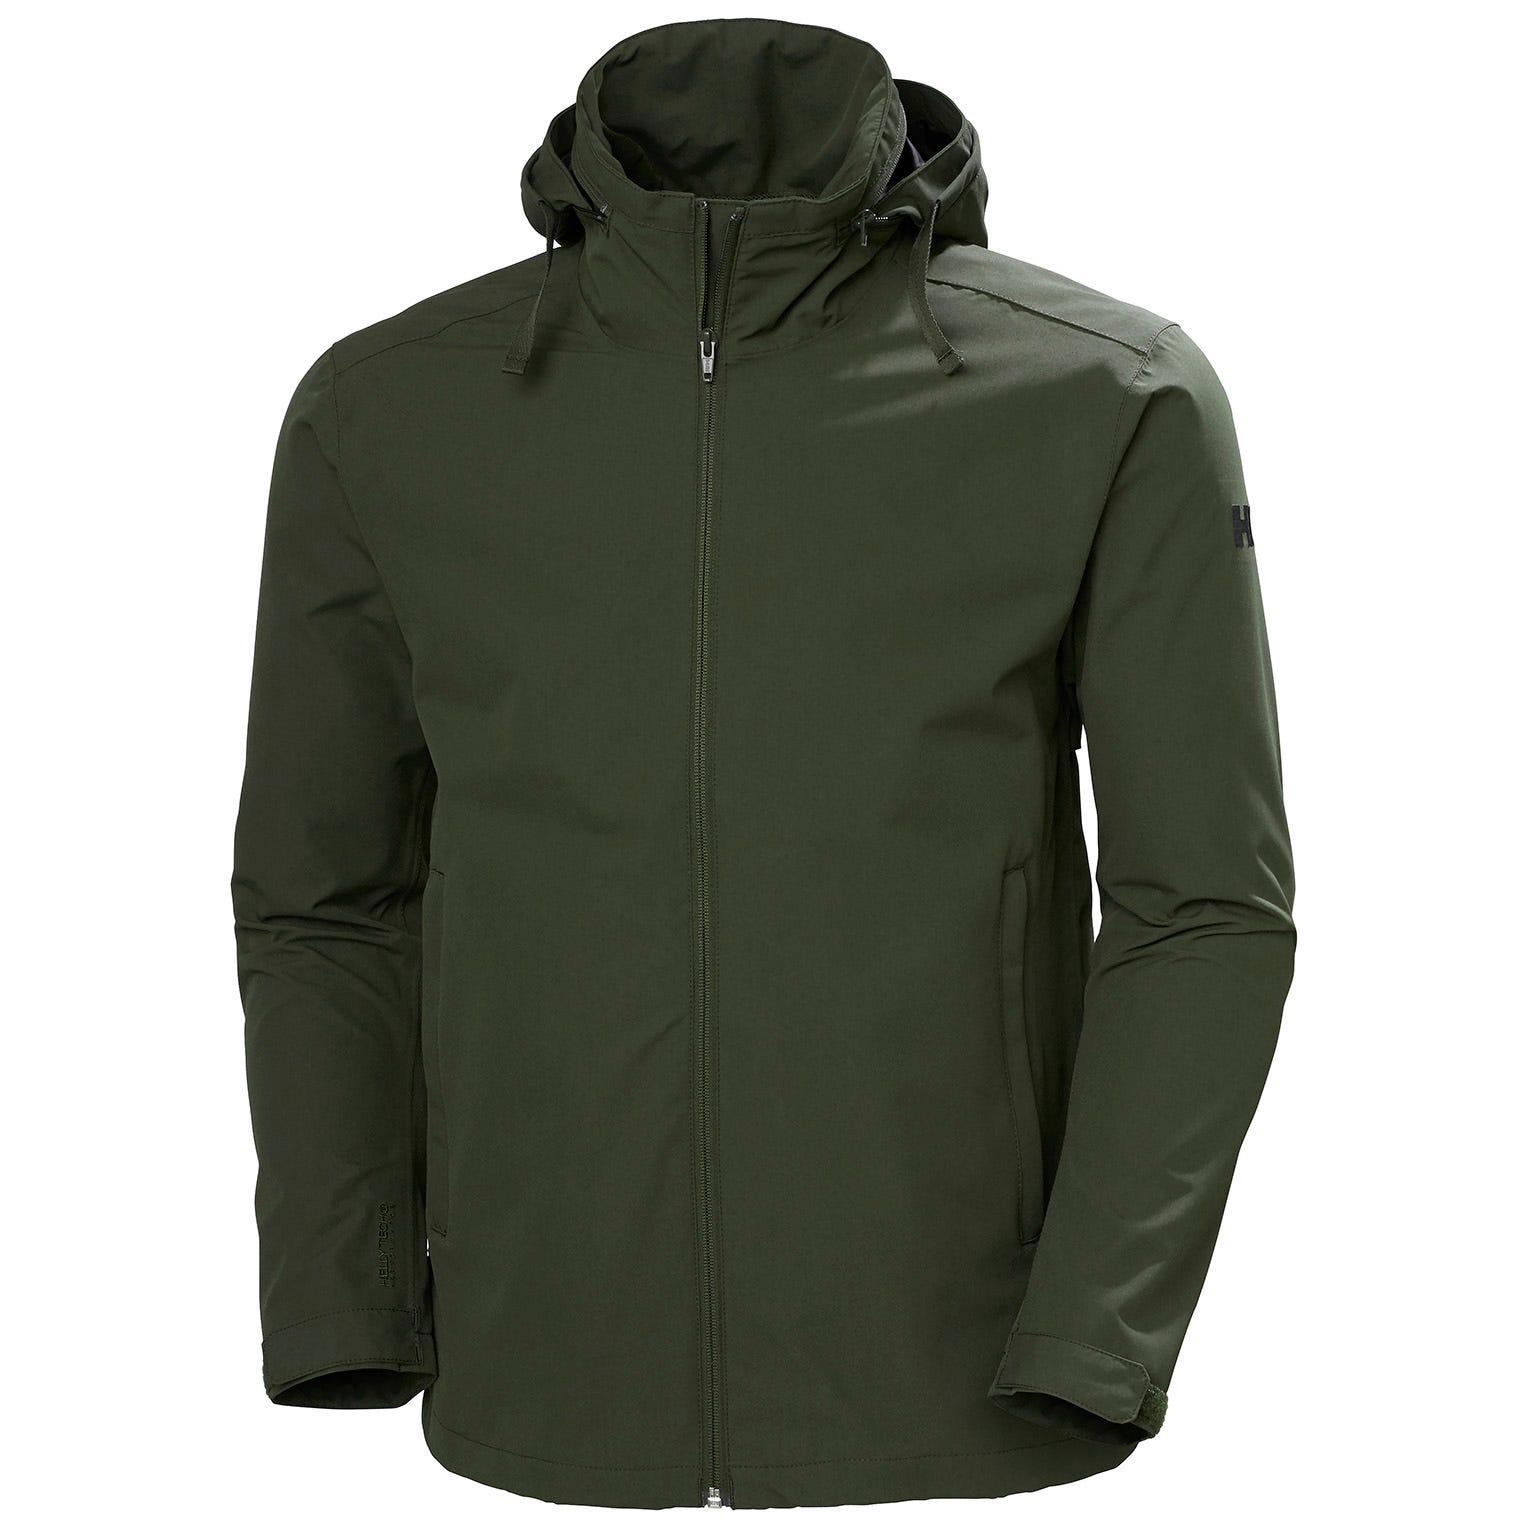 Helly Hansen Mens Mono Material Waterproof Rain Jacket S